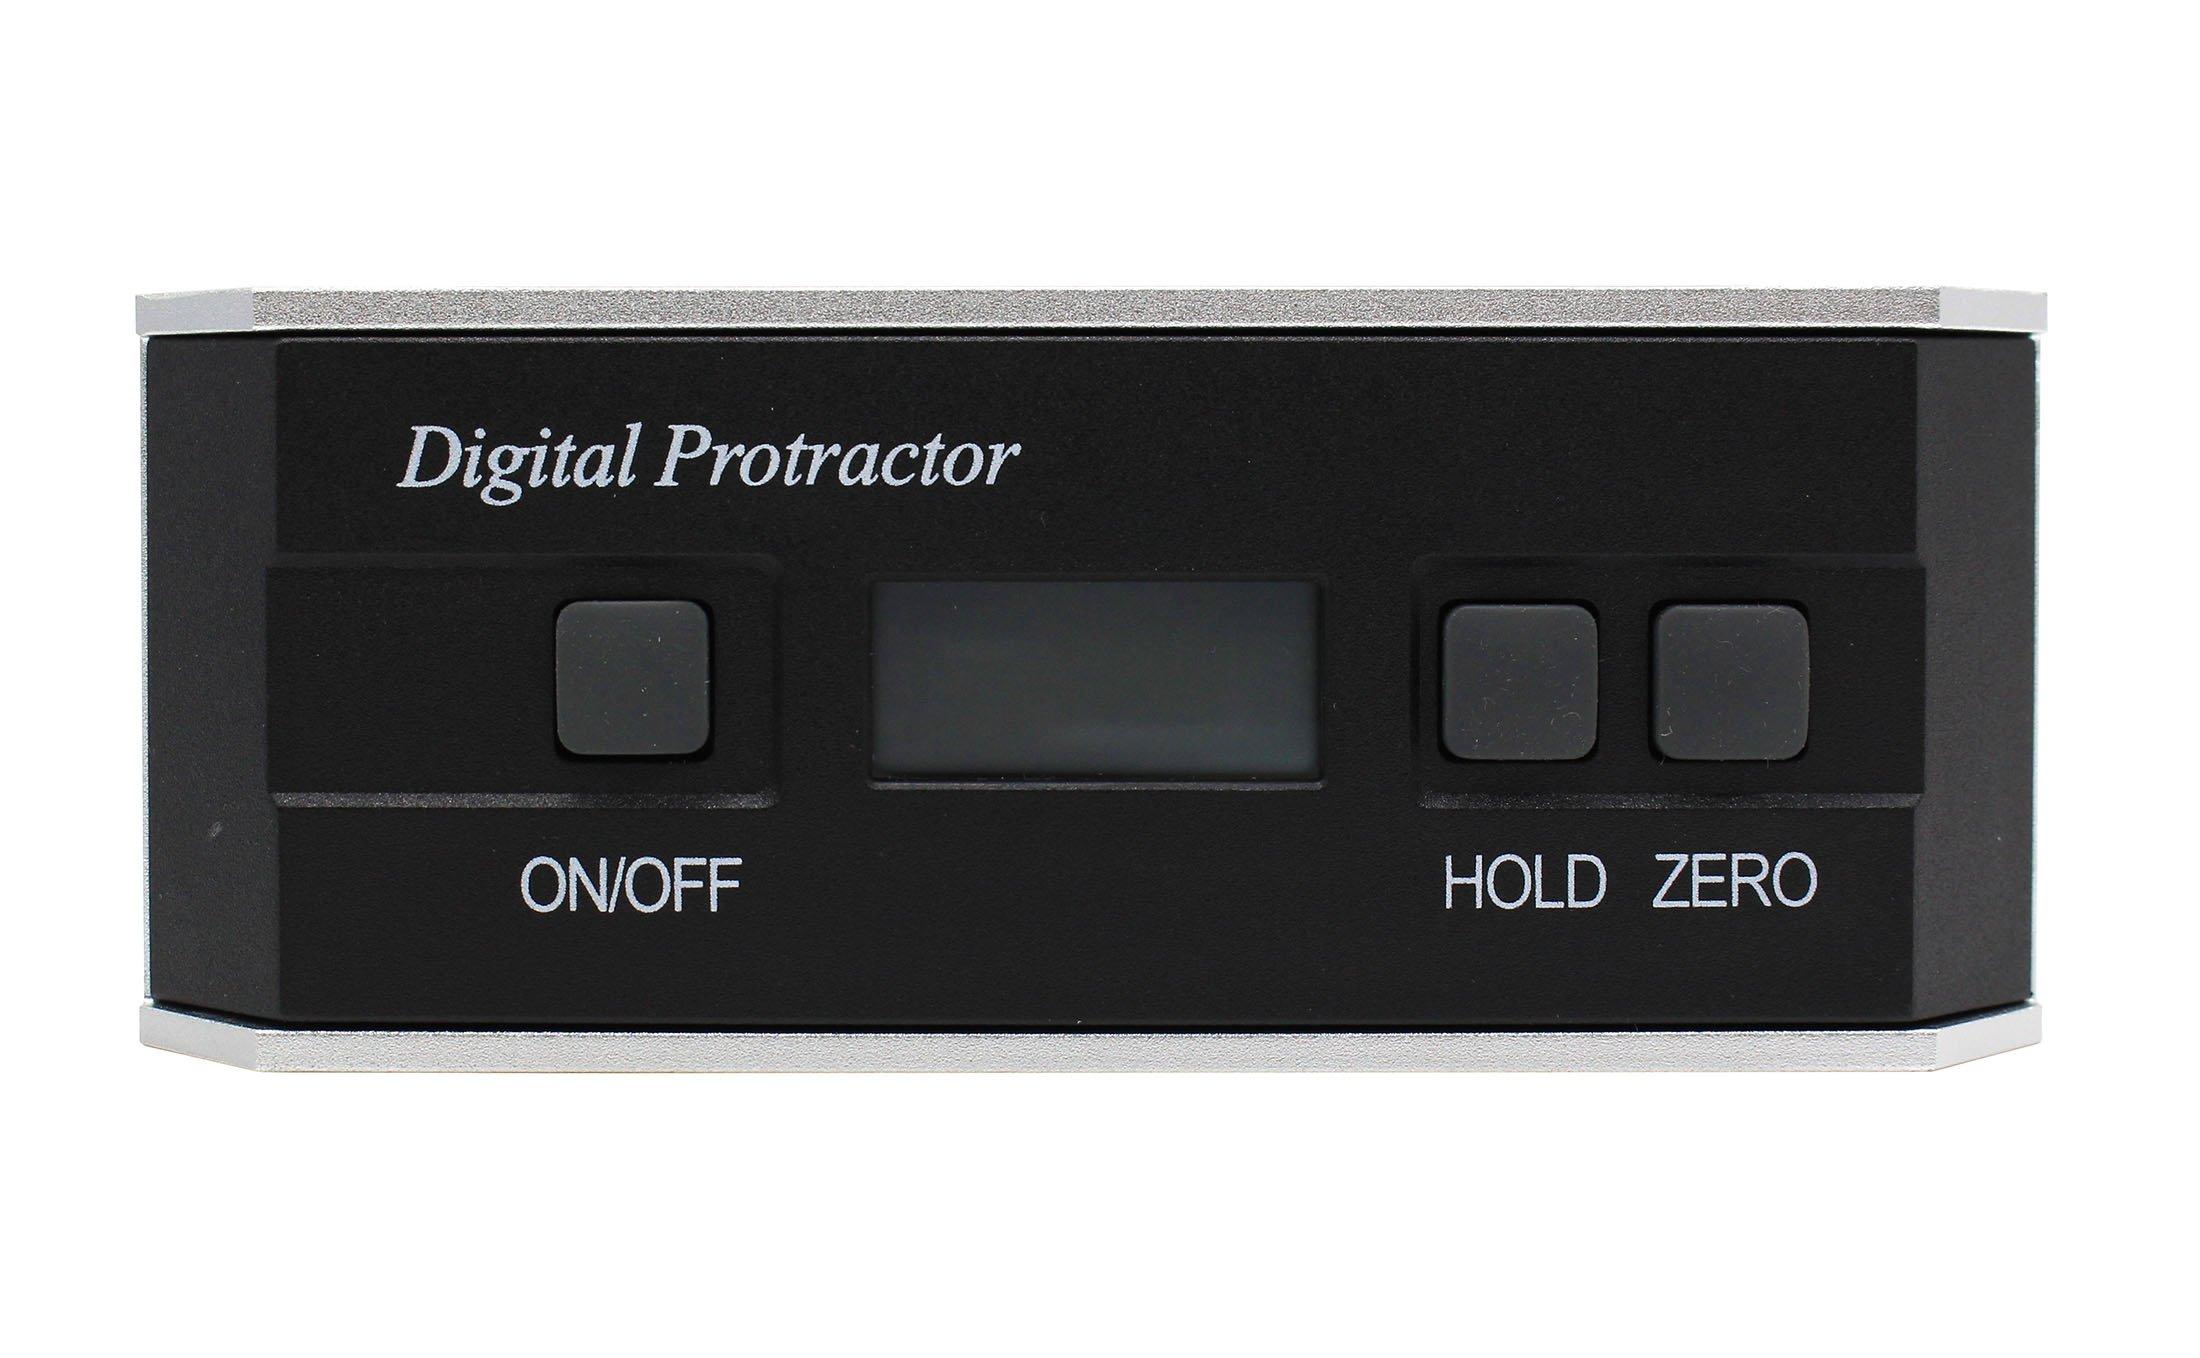 Angle Finder Angle Sensor Technology Tilt Digital Protractor Level Inclinometer Measuring tools Backlight 360 Degree with Magnetic V-groove